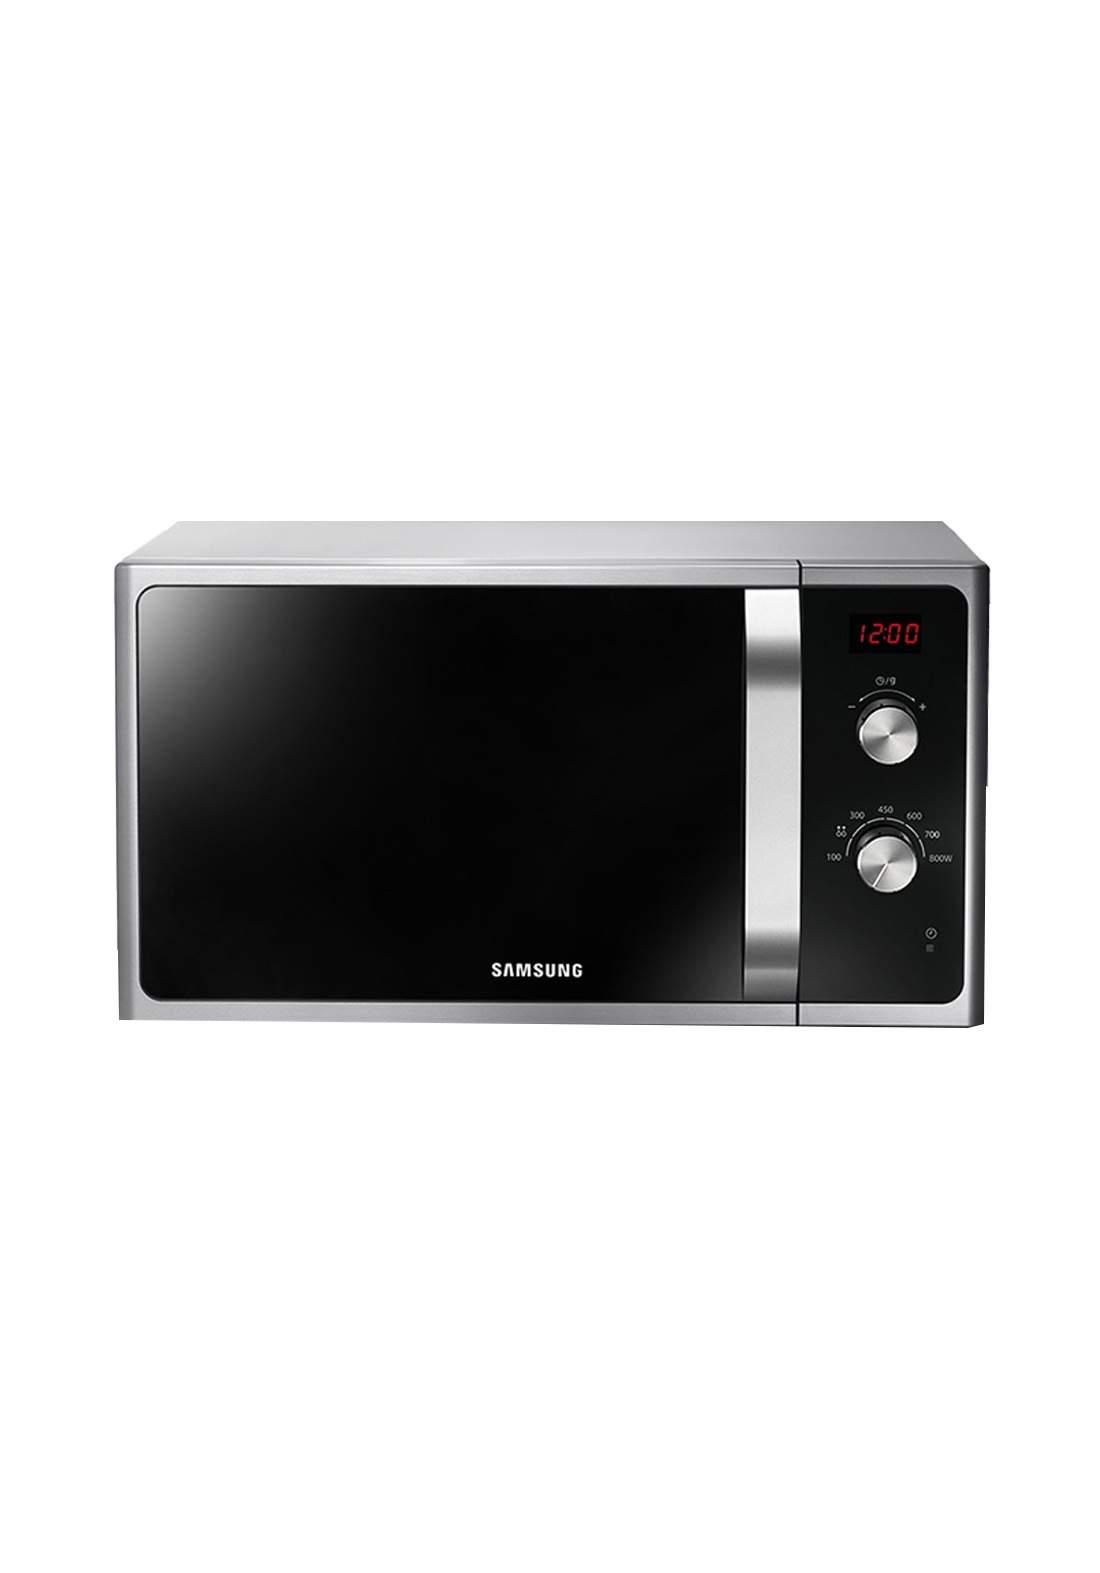 Samsung MS23F300EEK Microwave23L  فرن كهربائي